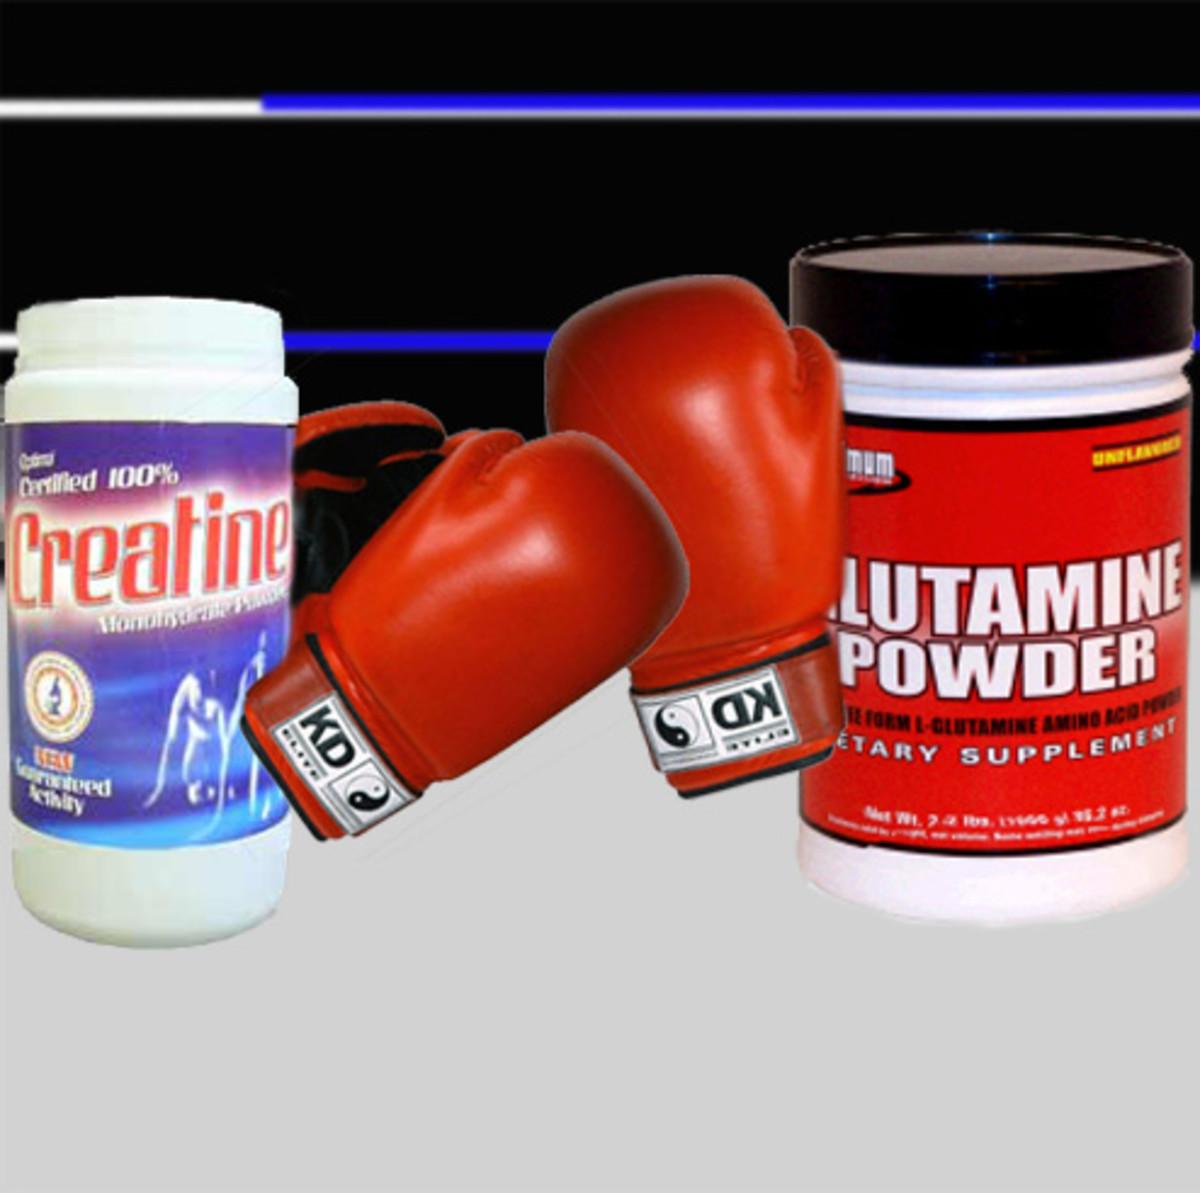 creatine_vs_glutamine_-_part_7_-_final_comparison